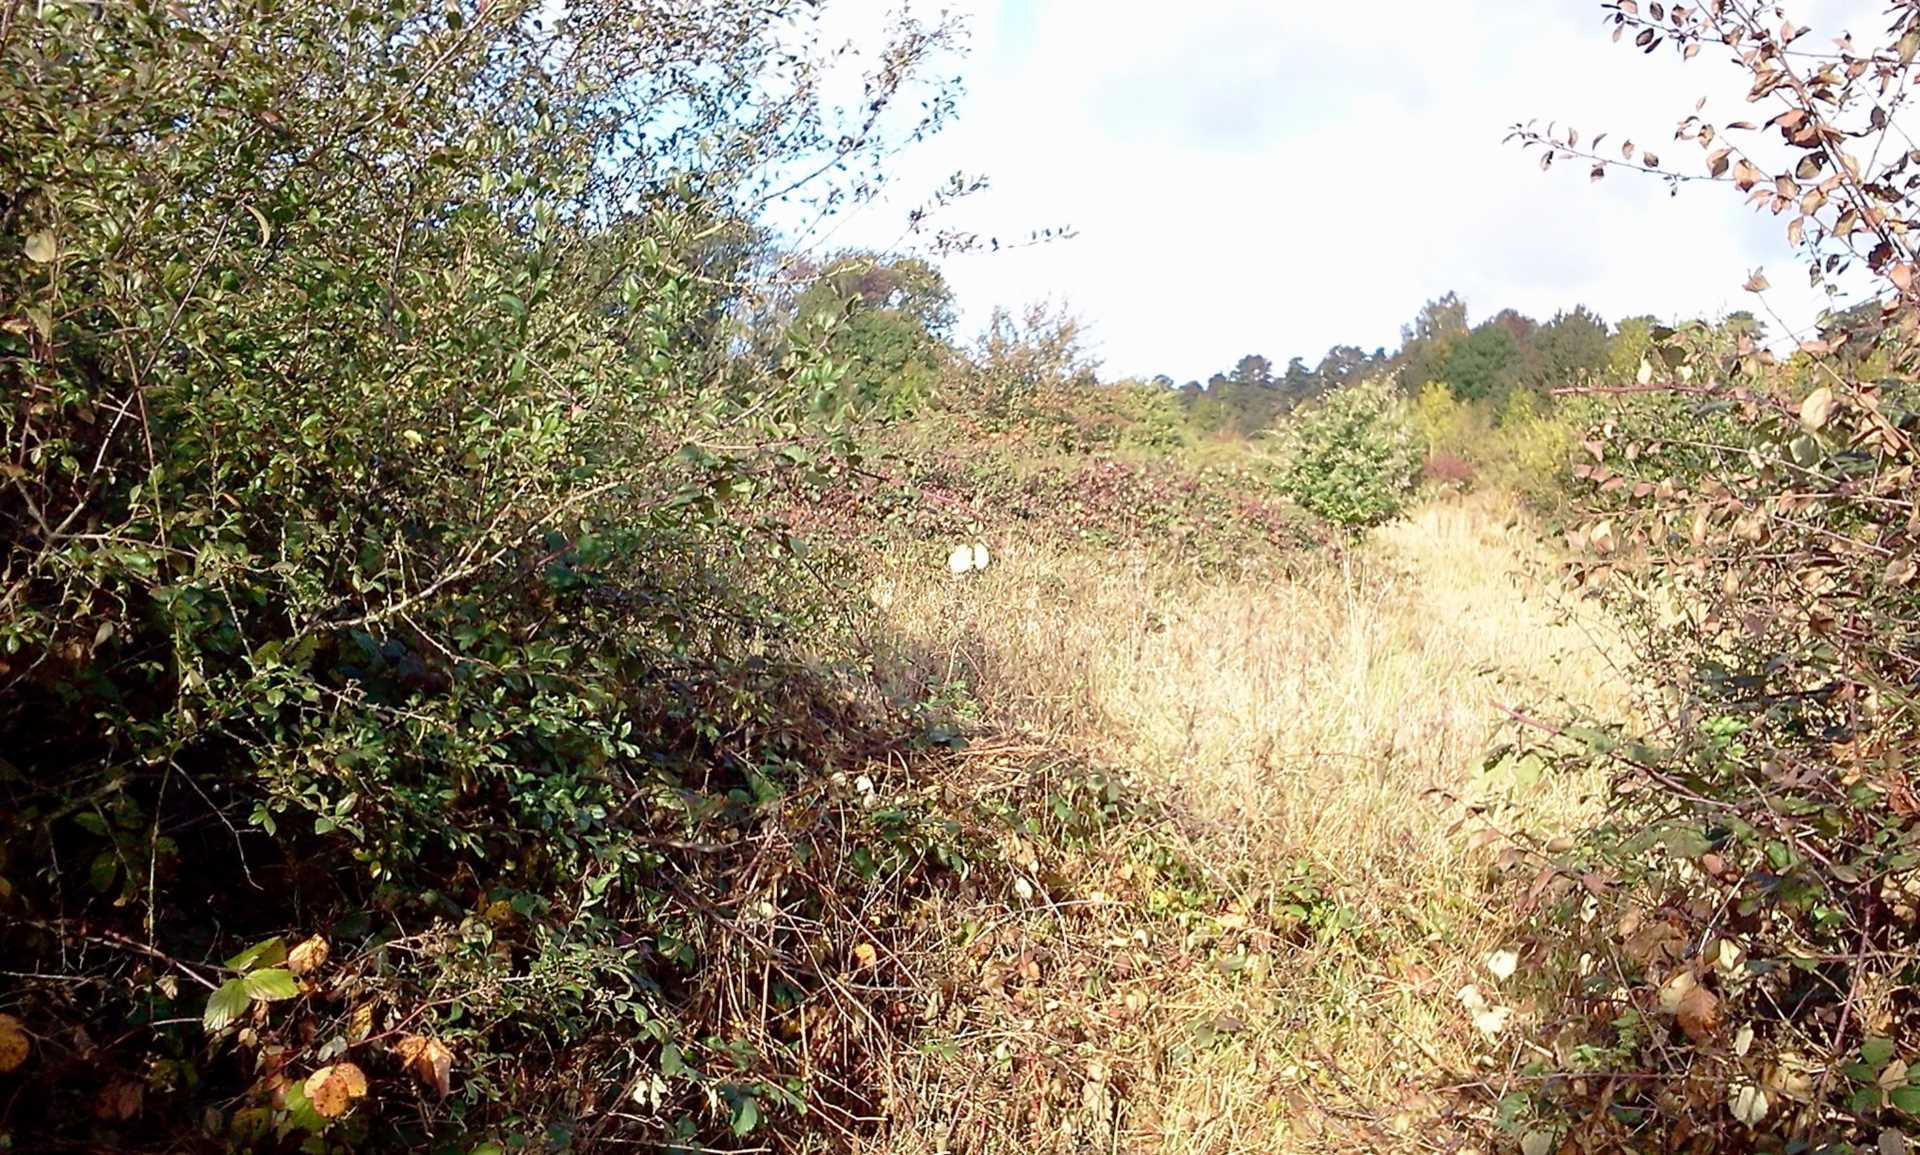 plots-of-land-for-sale-henley-on-thames-uk